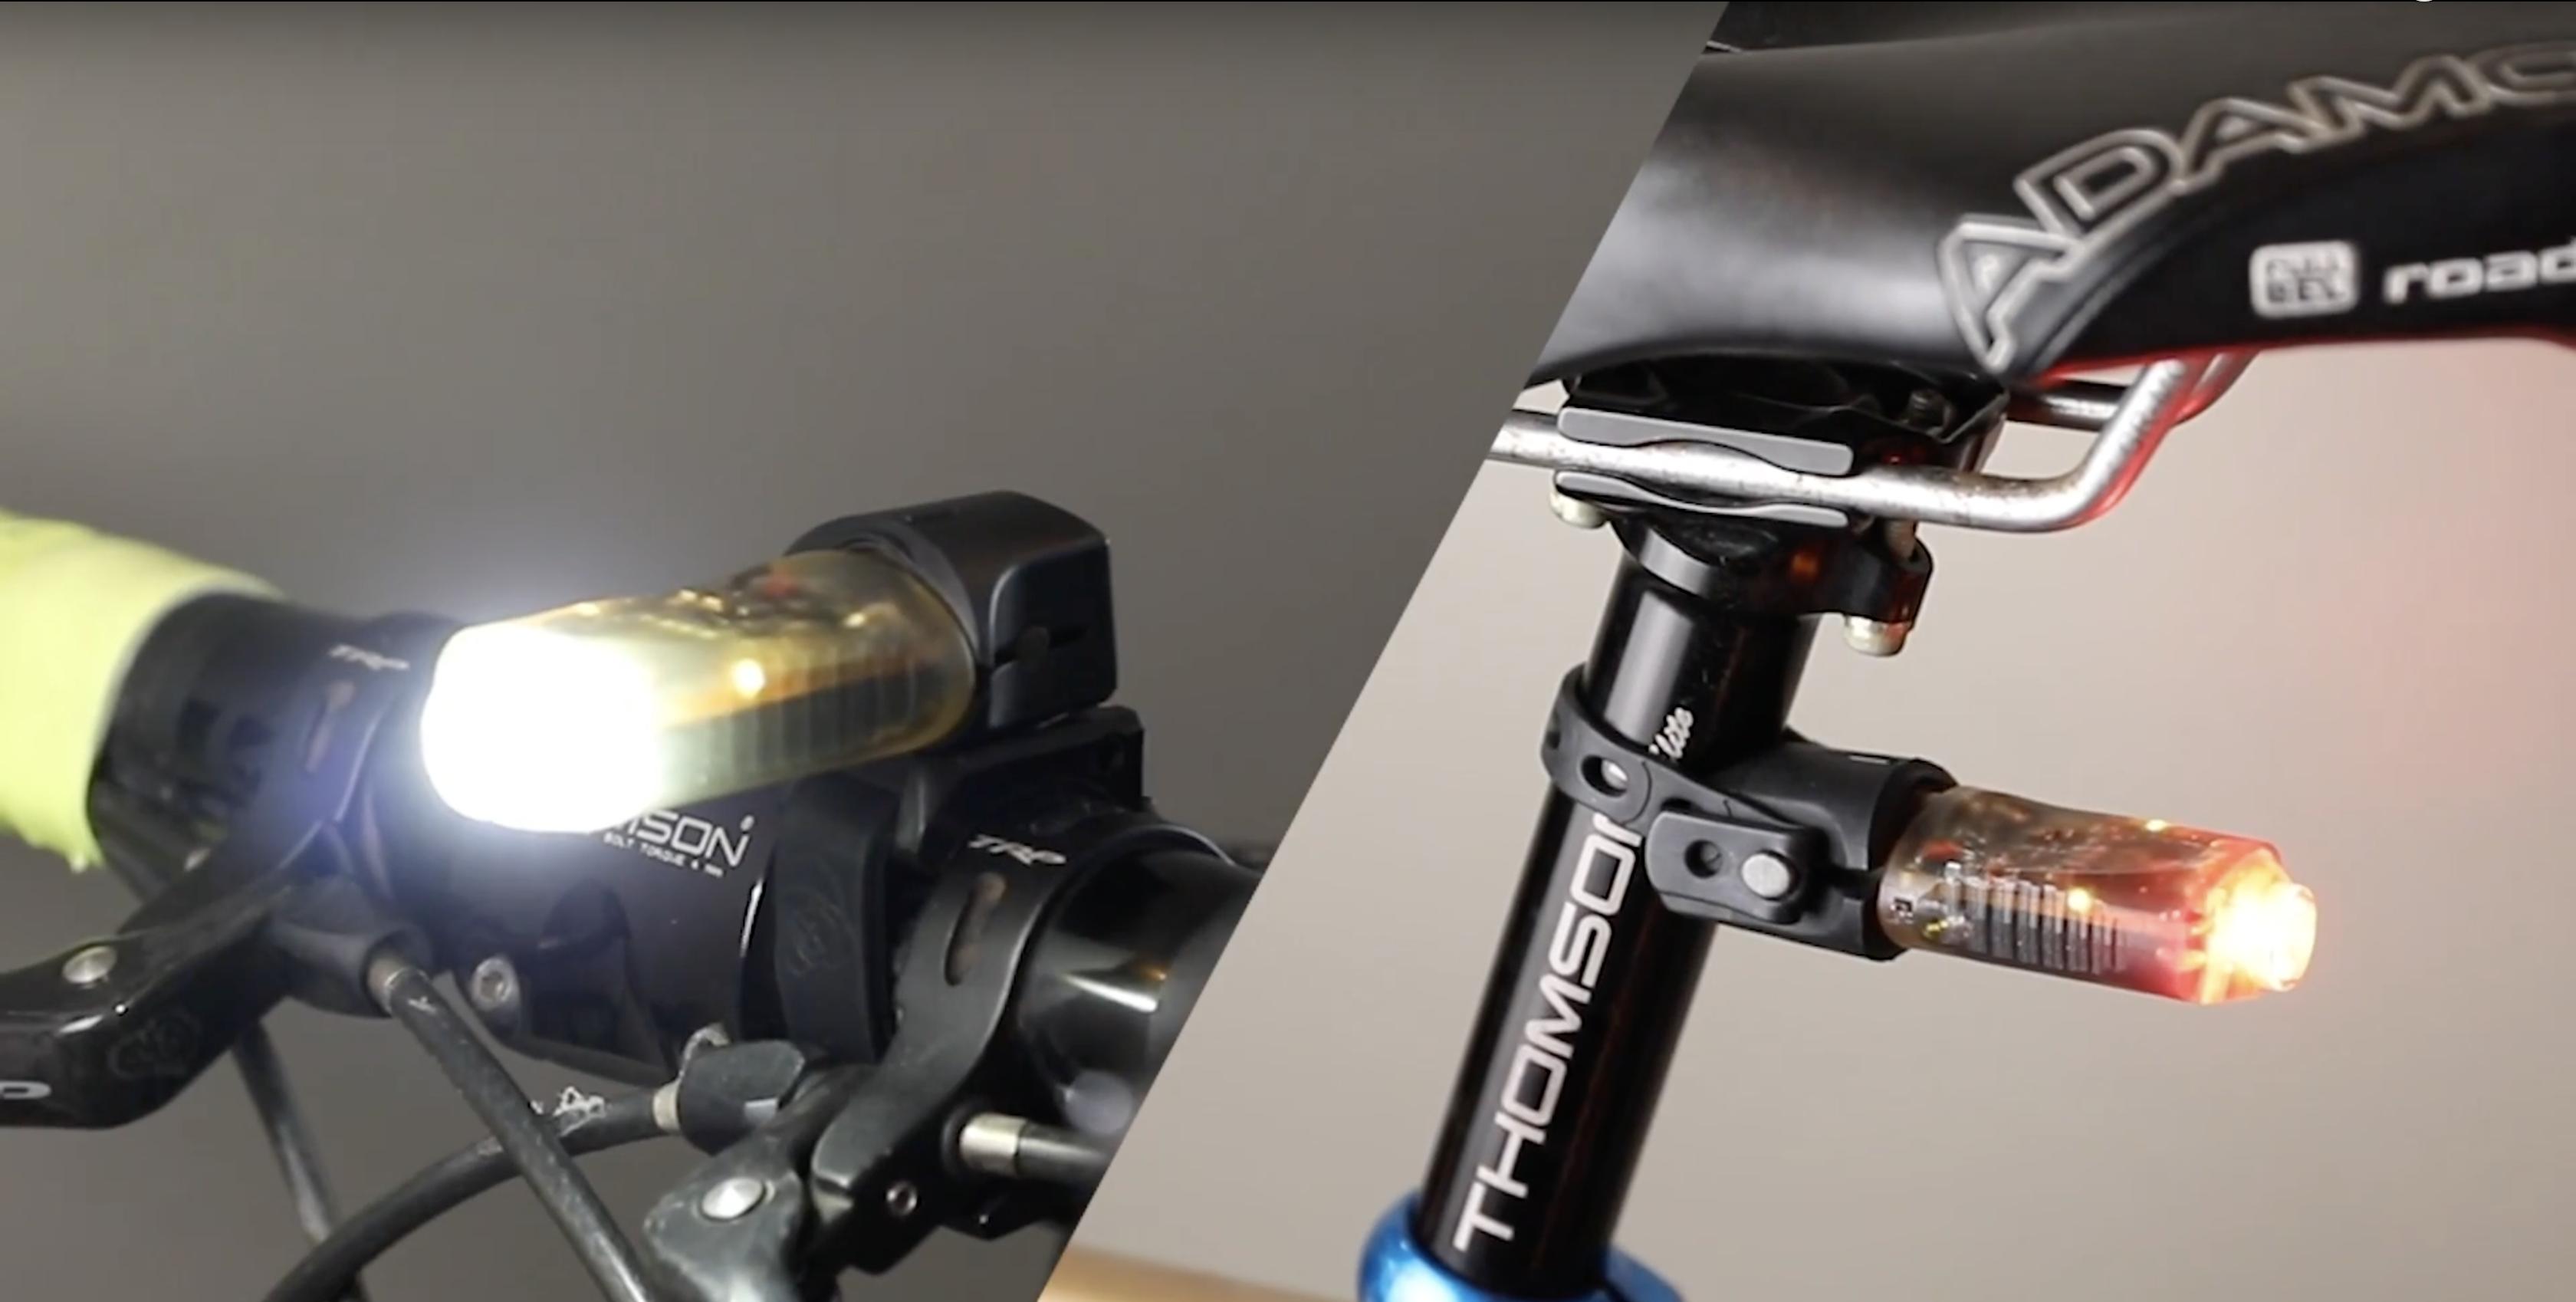 Luci per bicicletta luci led per biciclette idee green